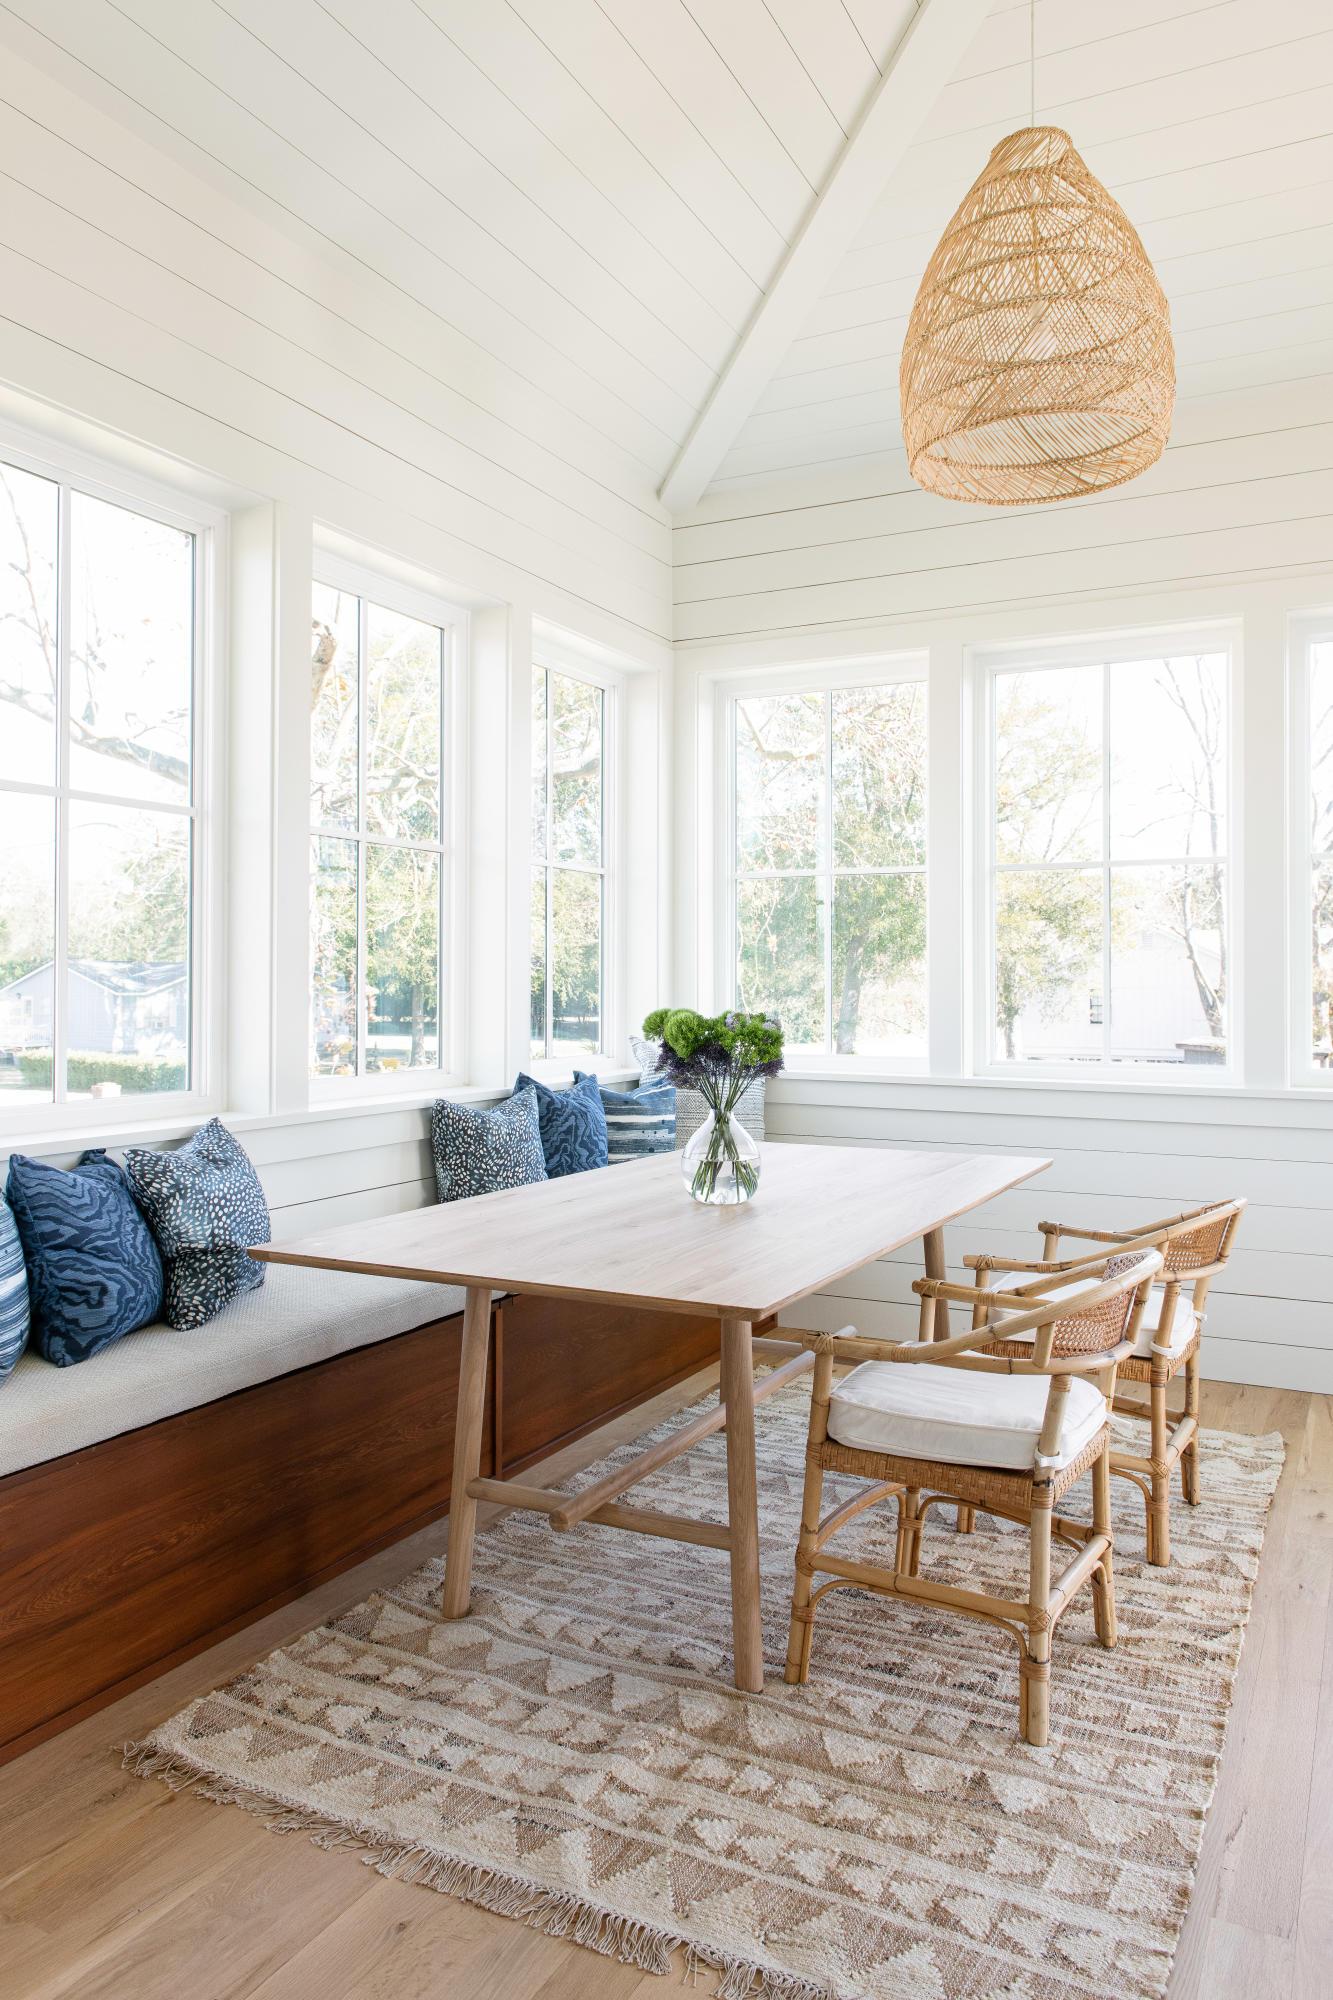 Scanlonville Homes For Sale - 181 5th, Mount Pleasant, SC - 22